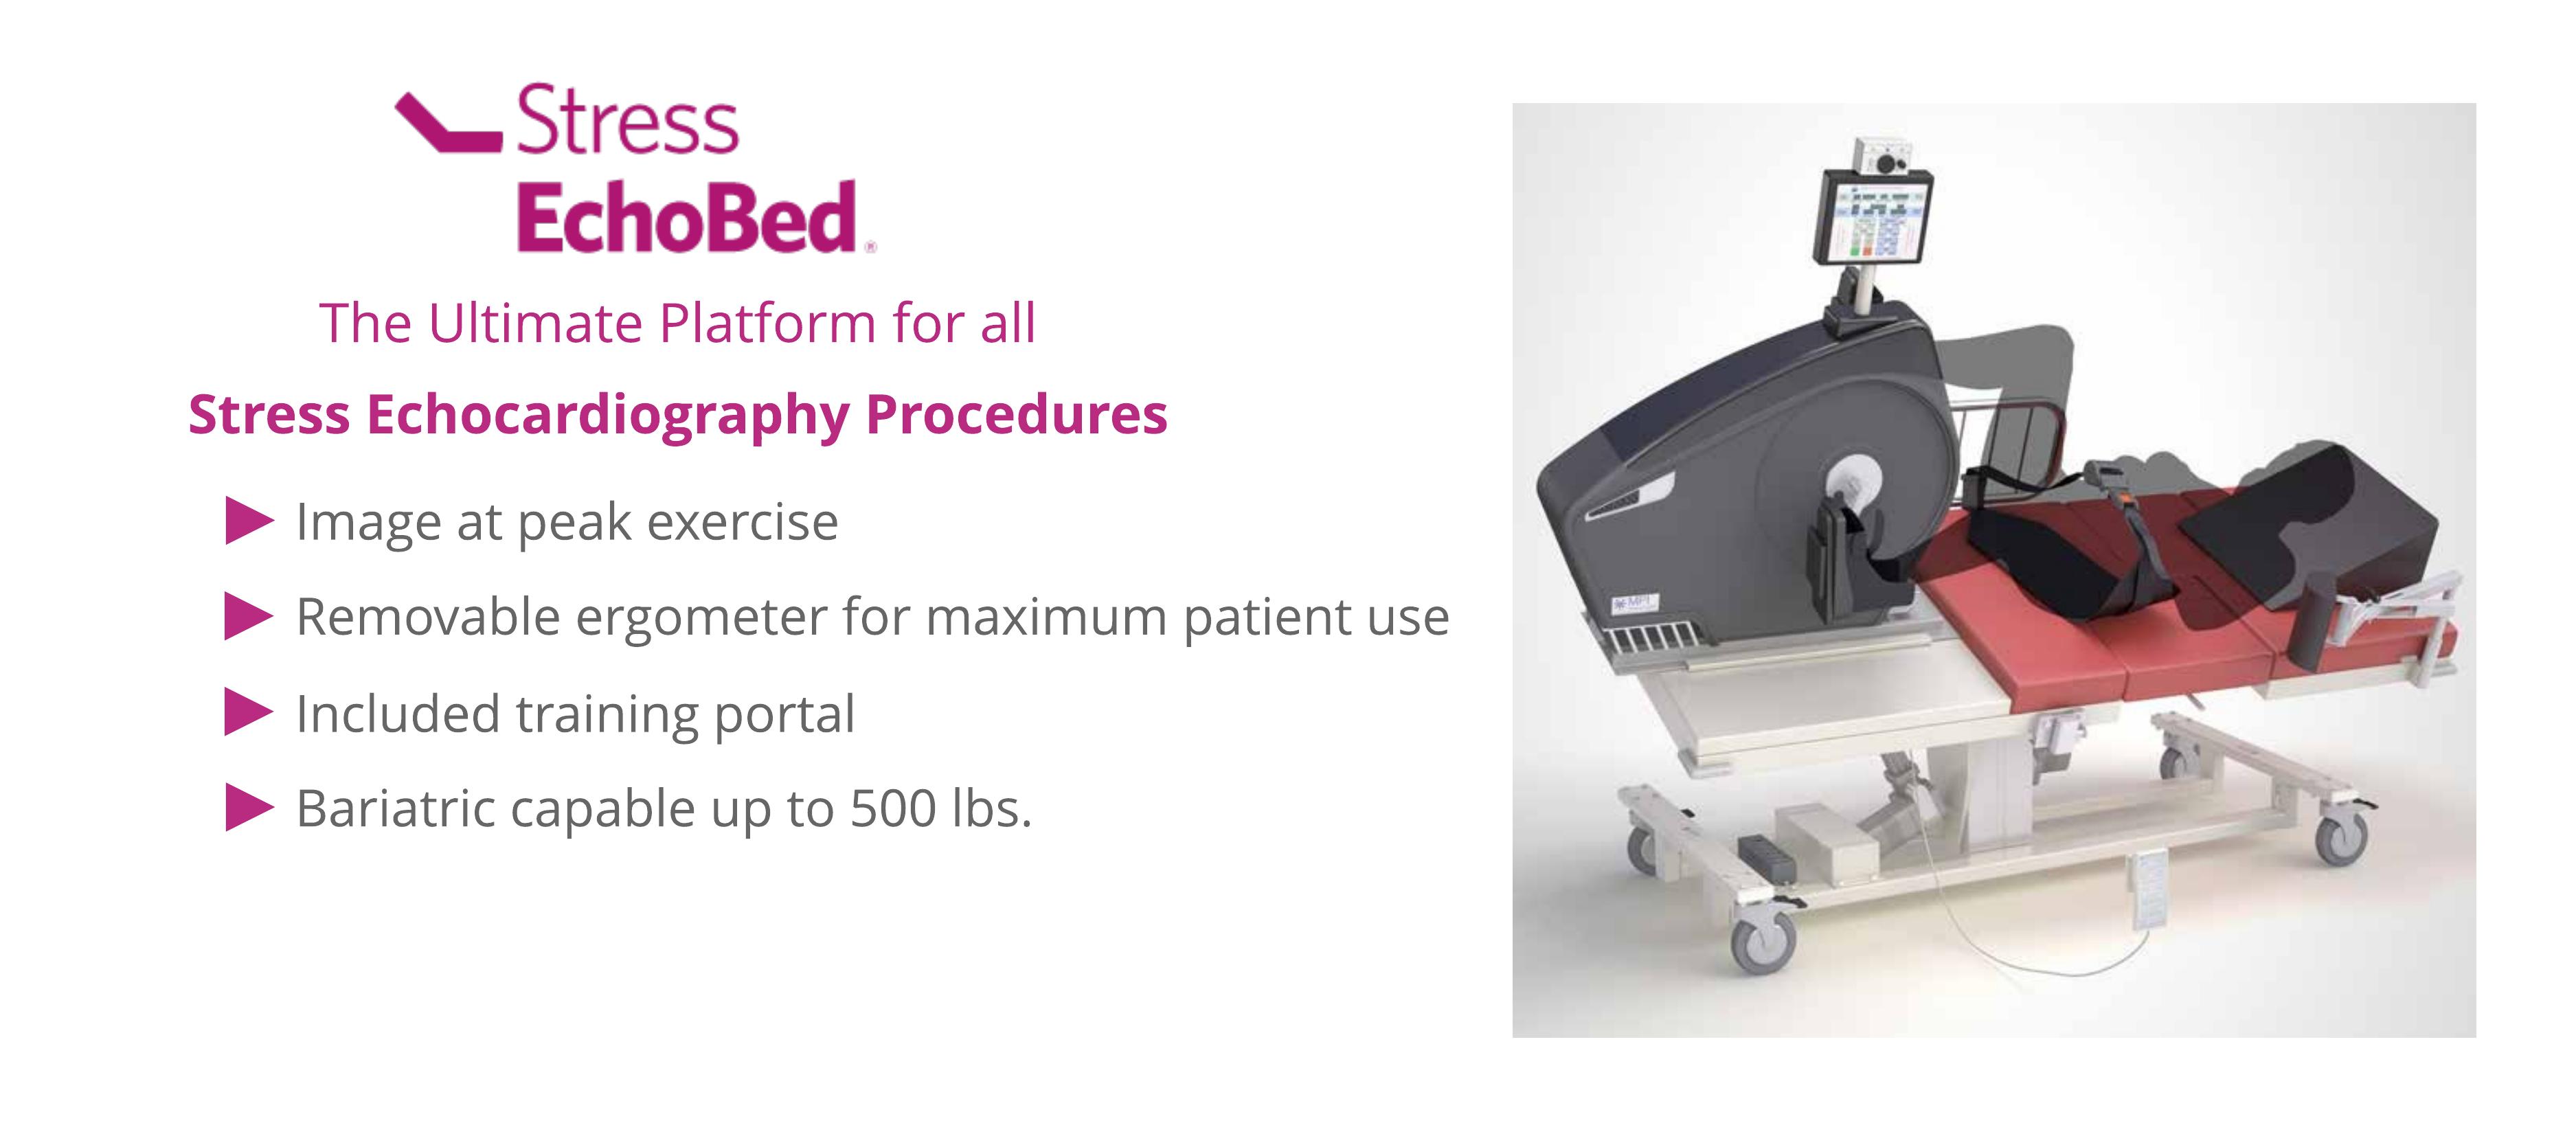 A platform for stress echocardiography procedures